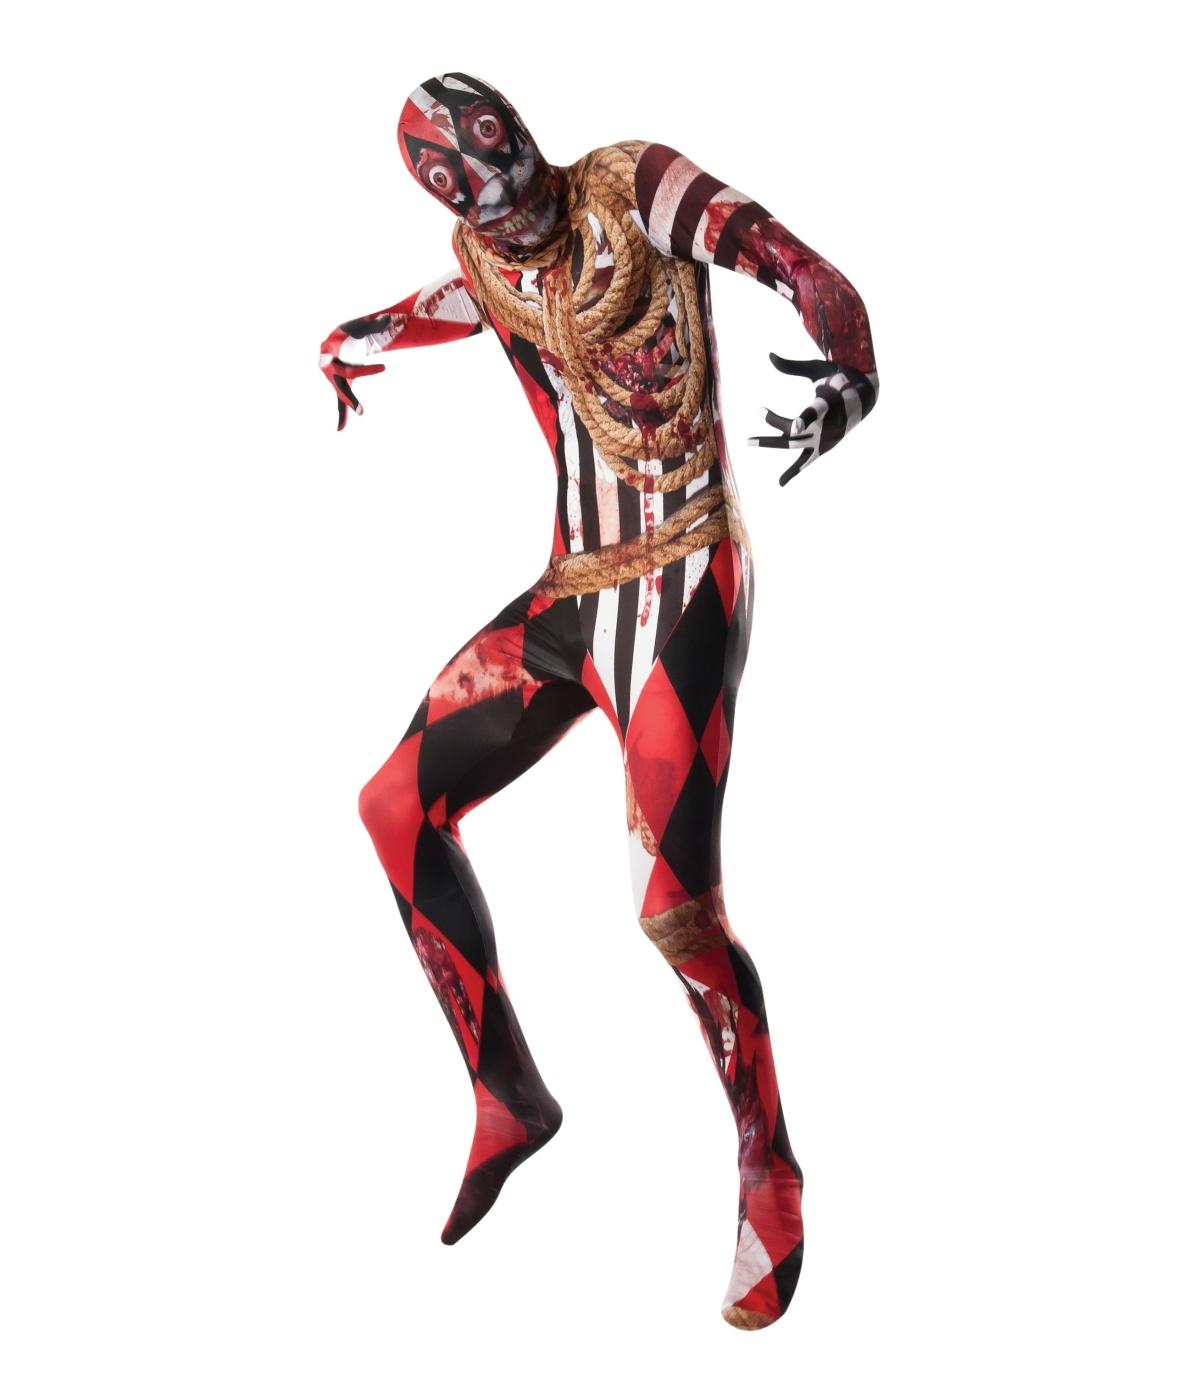 Image result for skin suit images